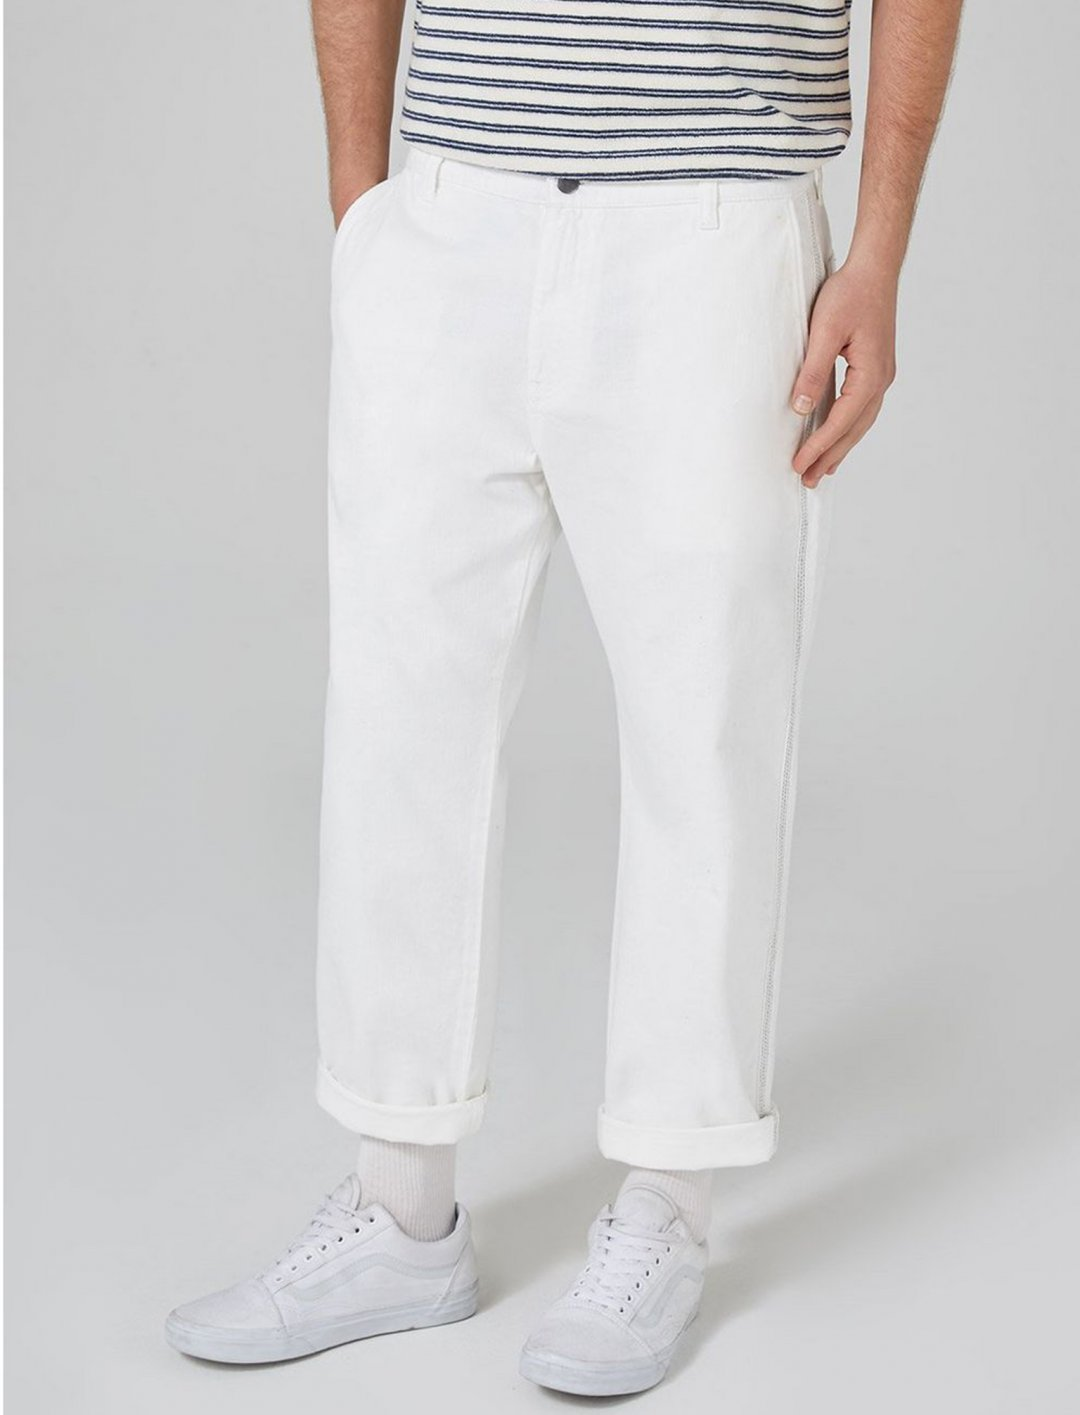 "LTD Ecru Work Trousers {""id"":5,""product_section_id"":1,""name"":""Clothing"",""order"":5} LTD"